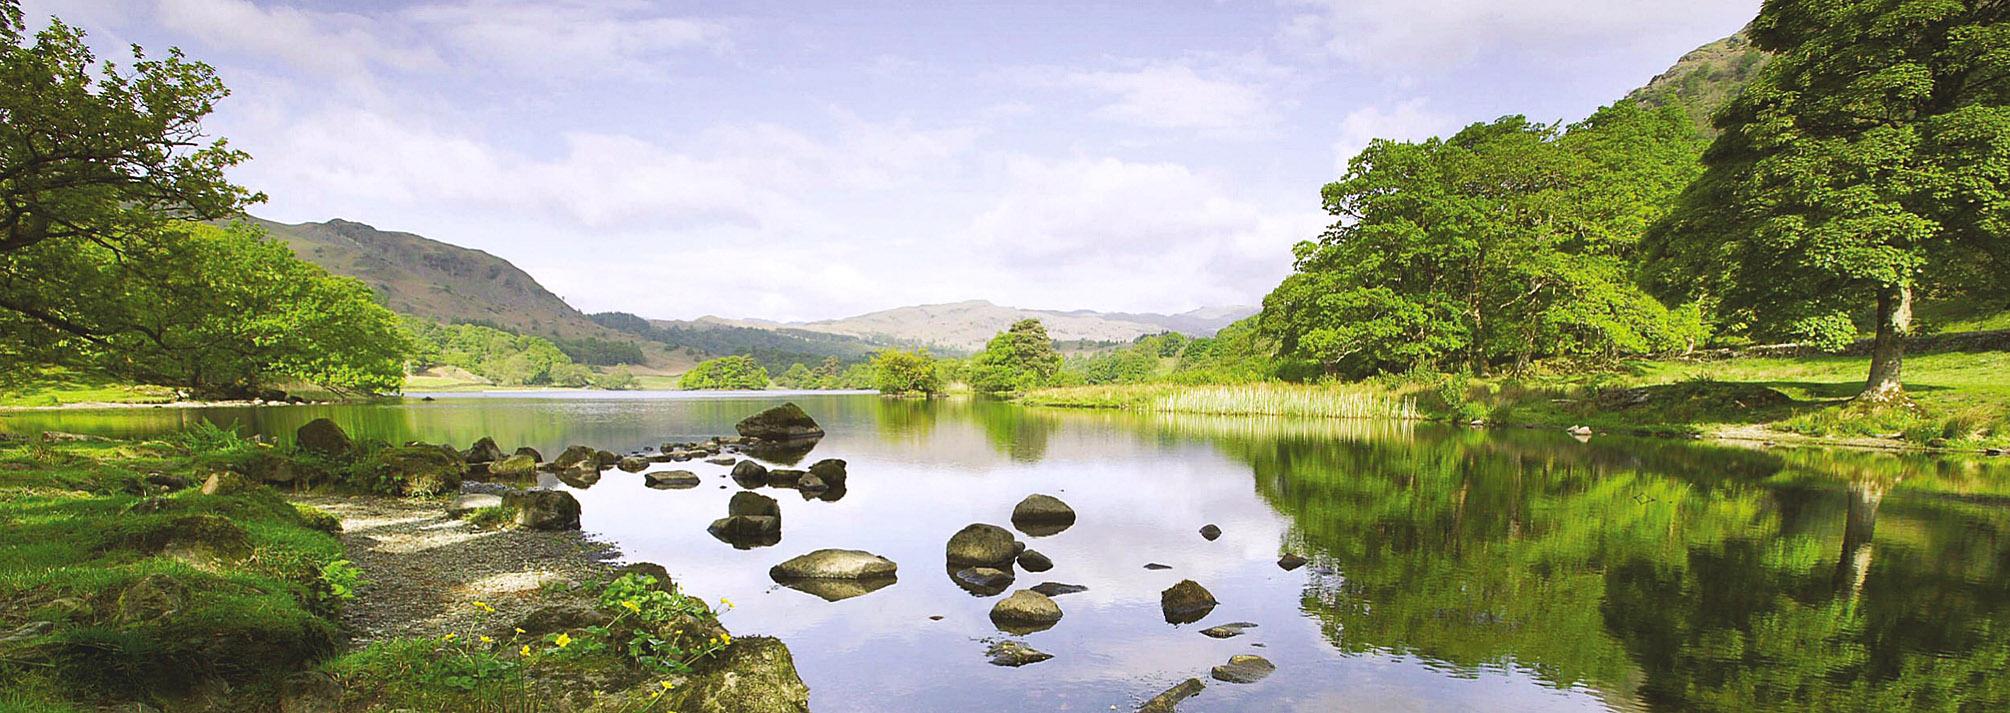 Rydal Water, Lake District.jpg